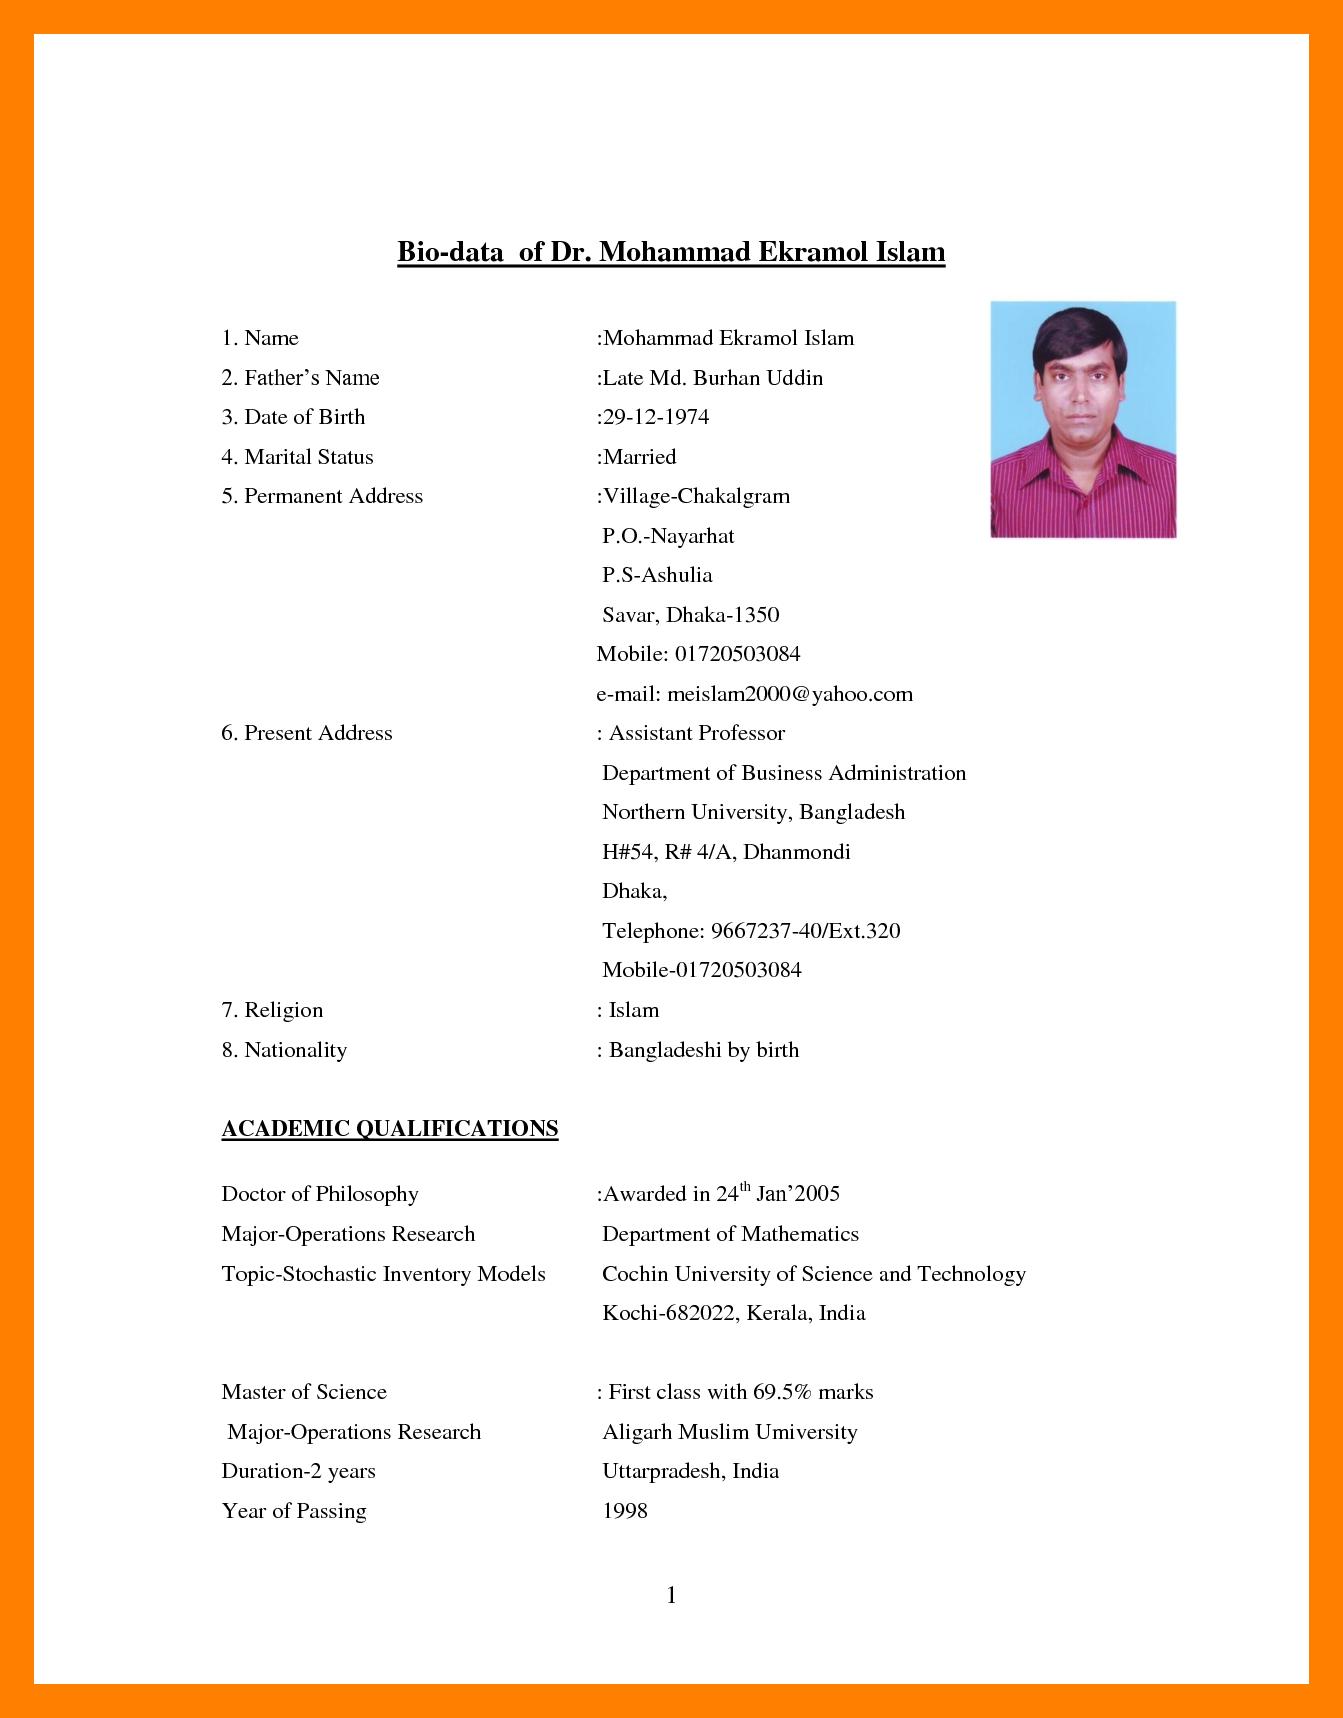 Curriculum Vitae Vs Resume 2dd997699e3e5fc16d5e09ddf444744e Marriage Biodata Format Biodata Format Bio Data For Marriage